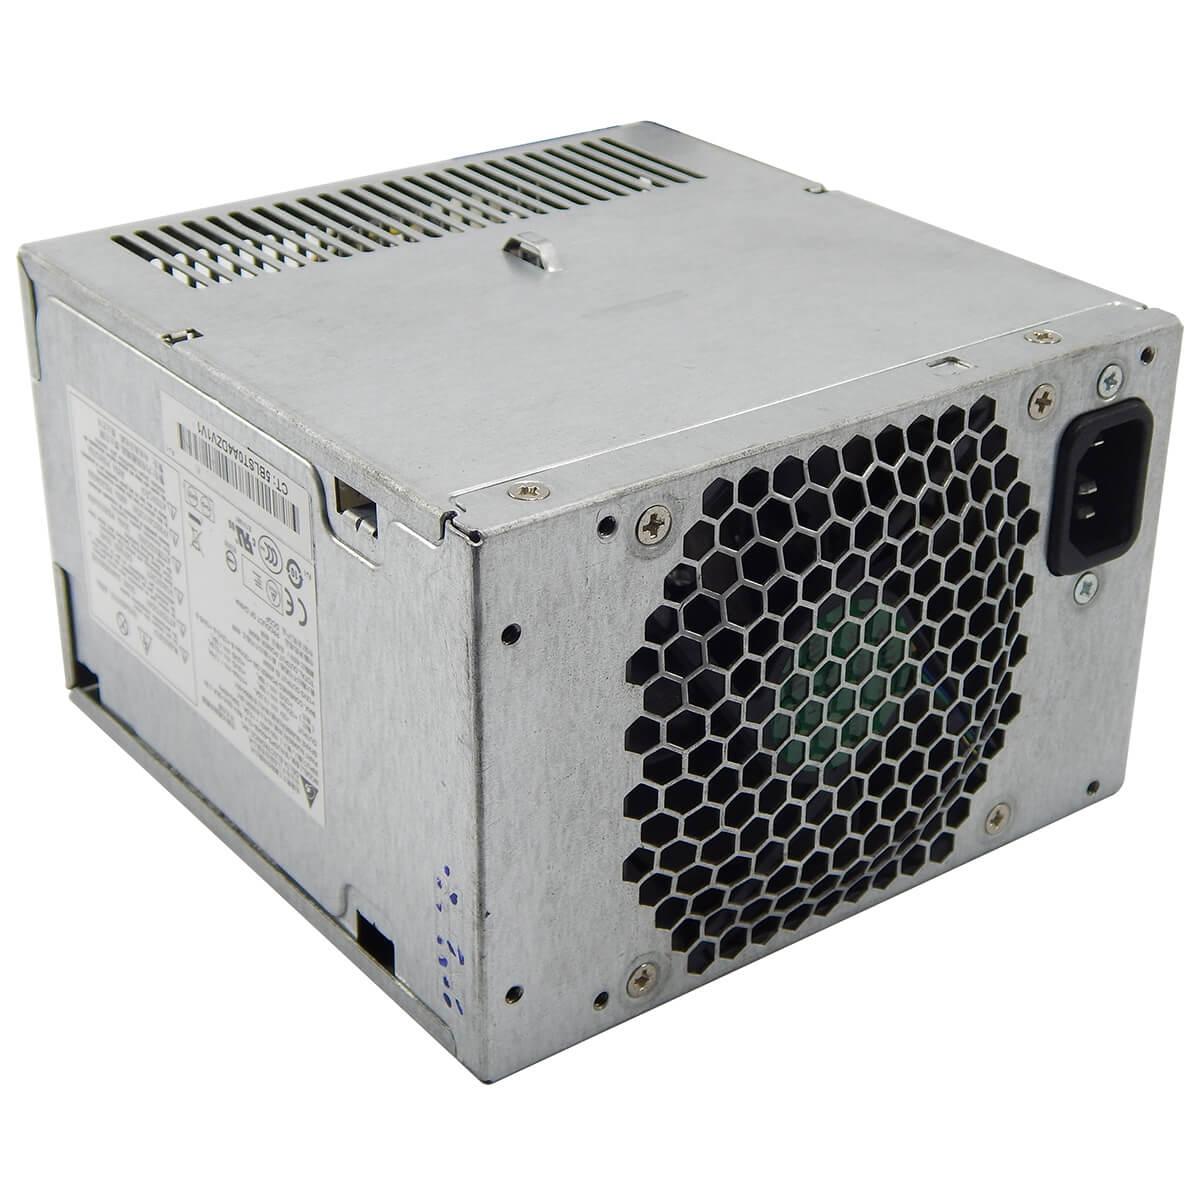 Fonte Delta HP Workstation DPS-400AB-13 400w 18 Pinos - Usada